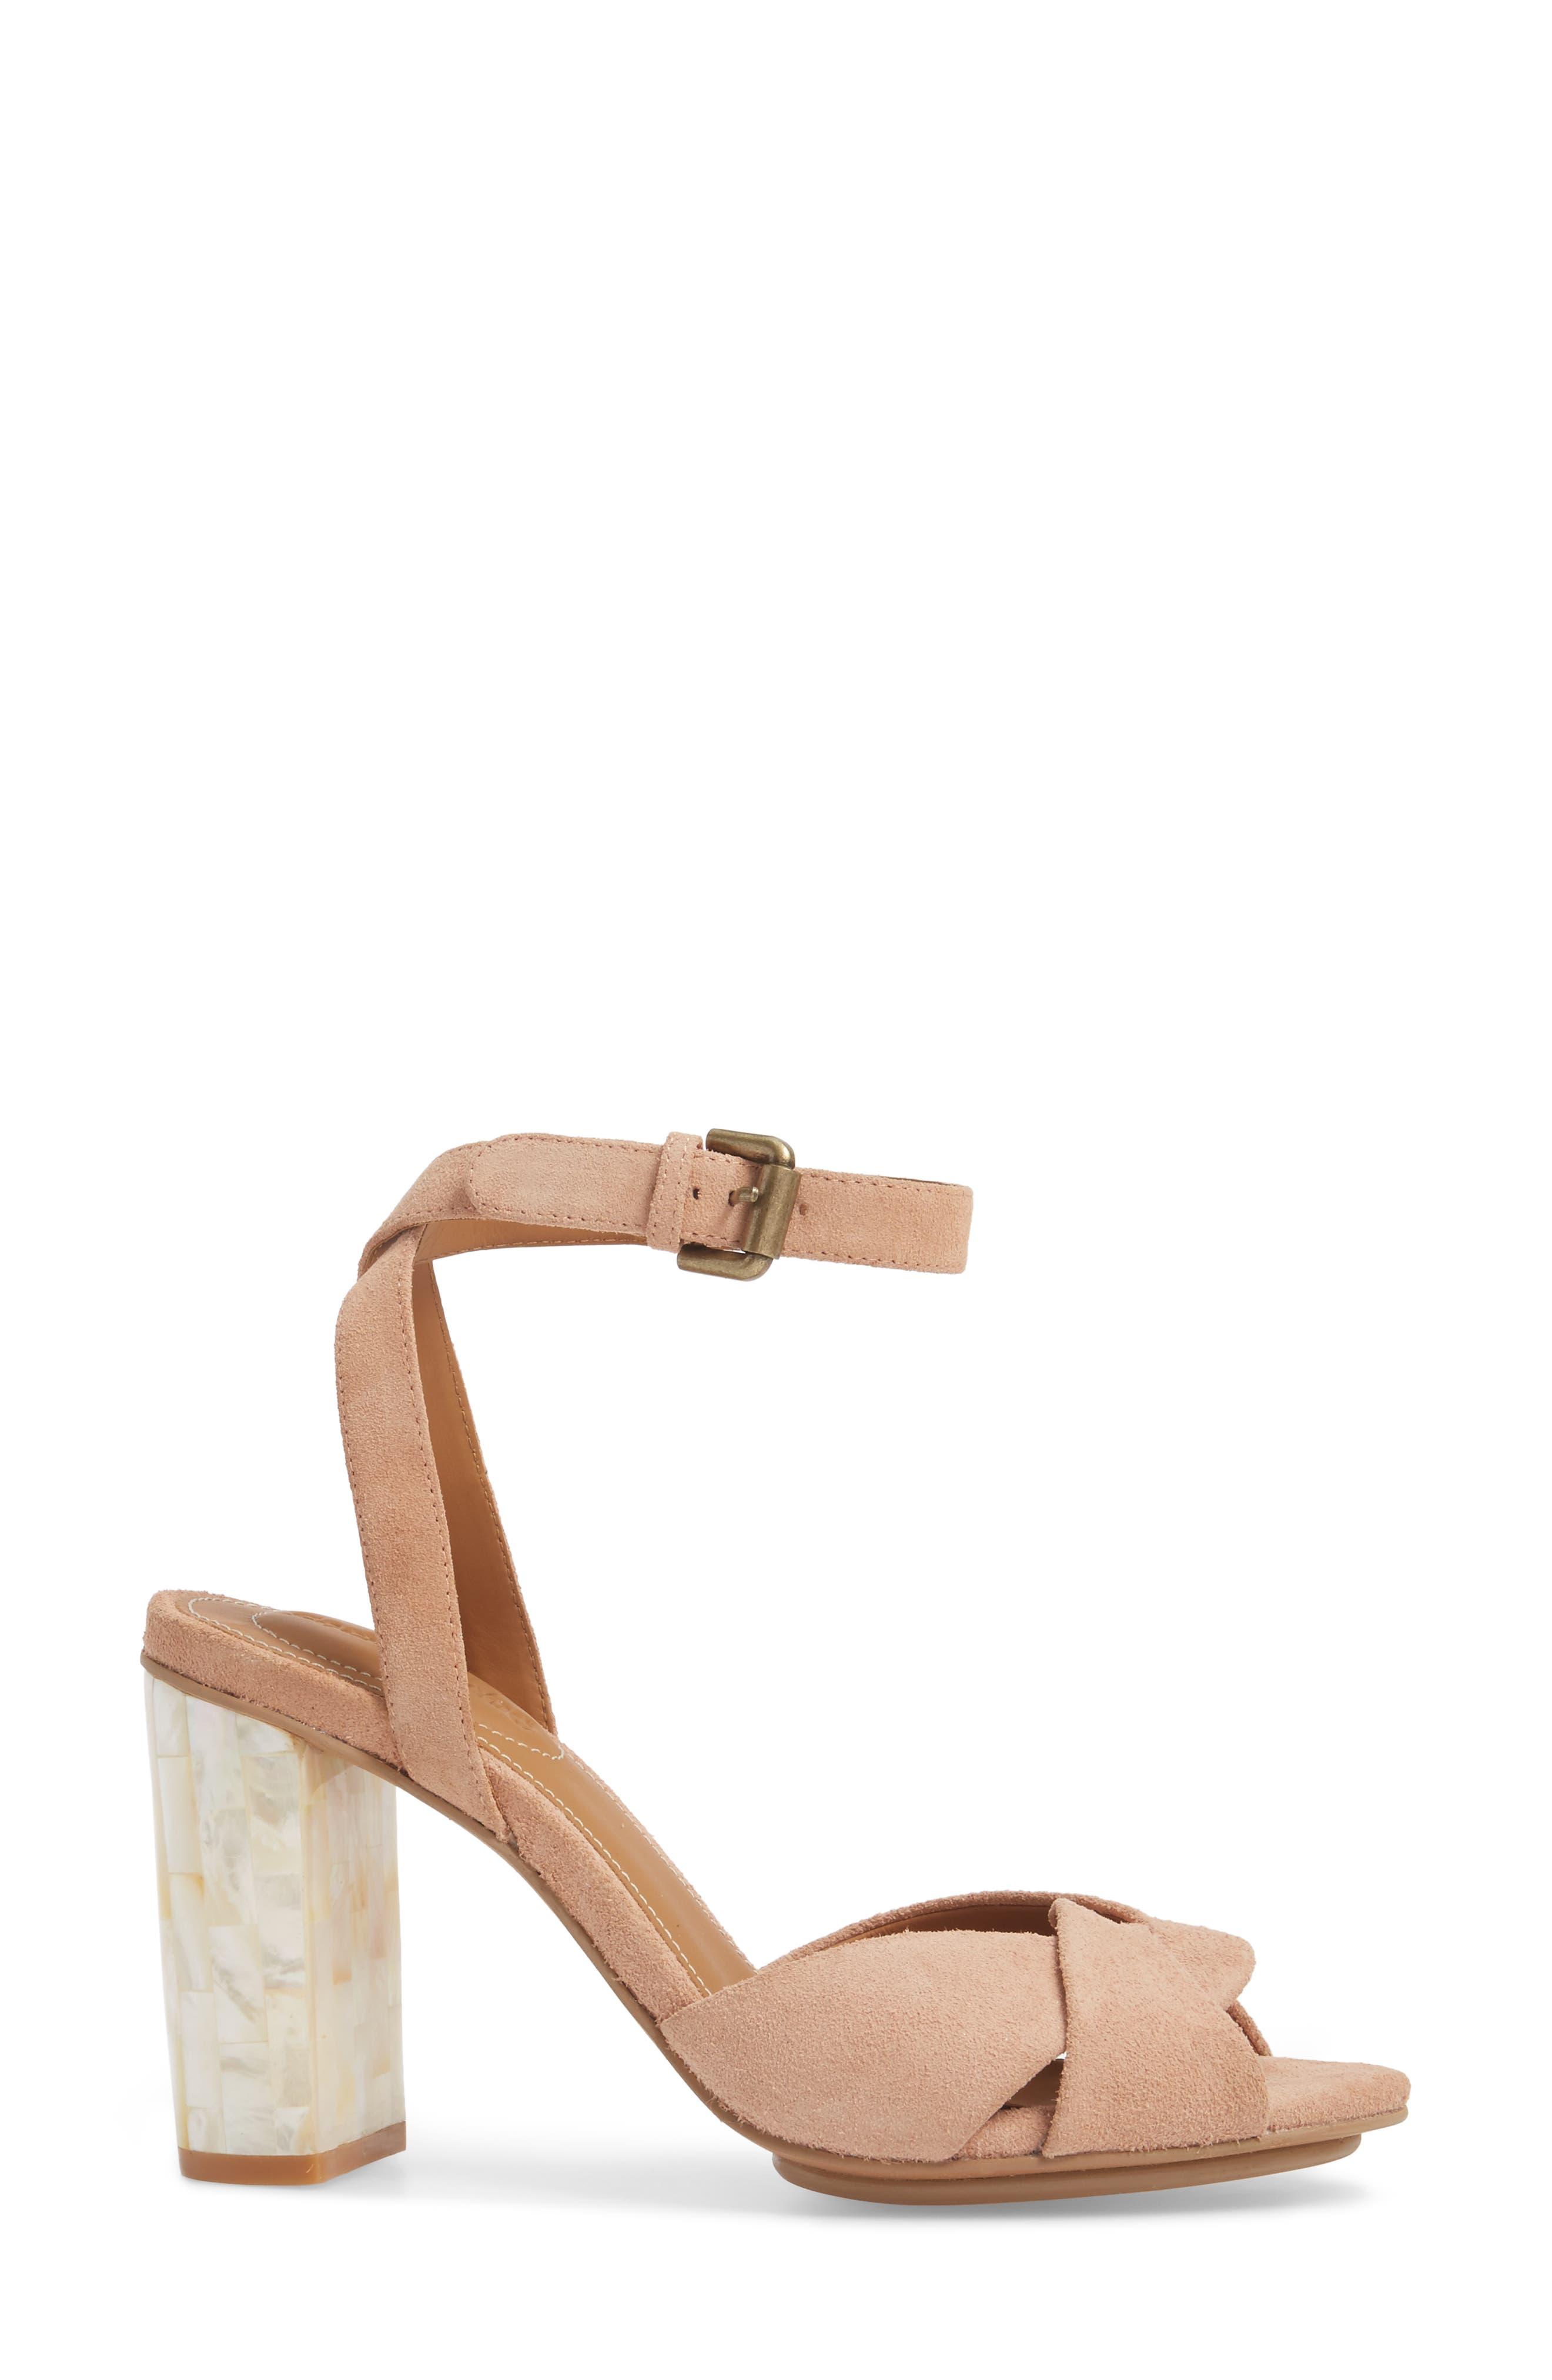 Isida Block Heel Sandal,                             Alternate thumbnail 3, color,                             Cipria